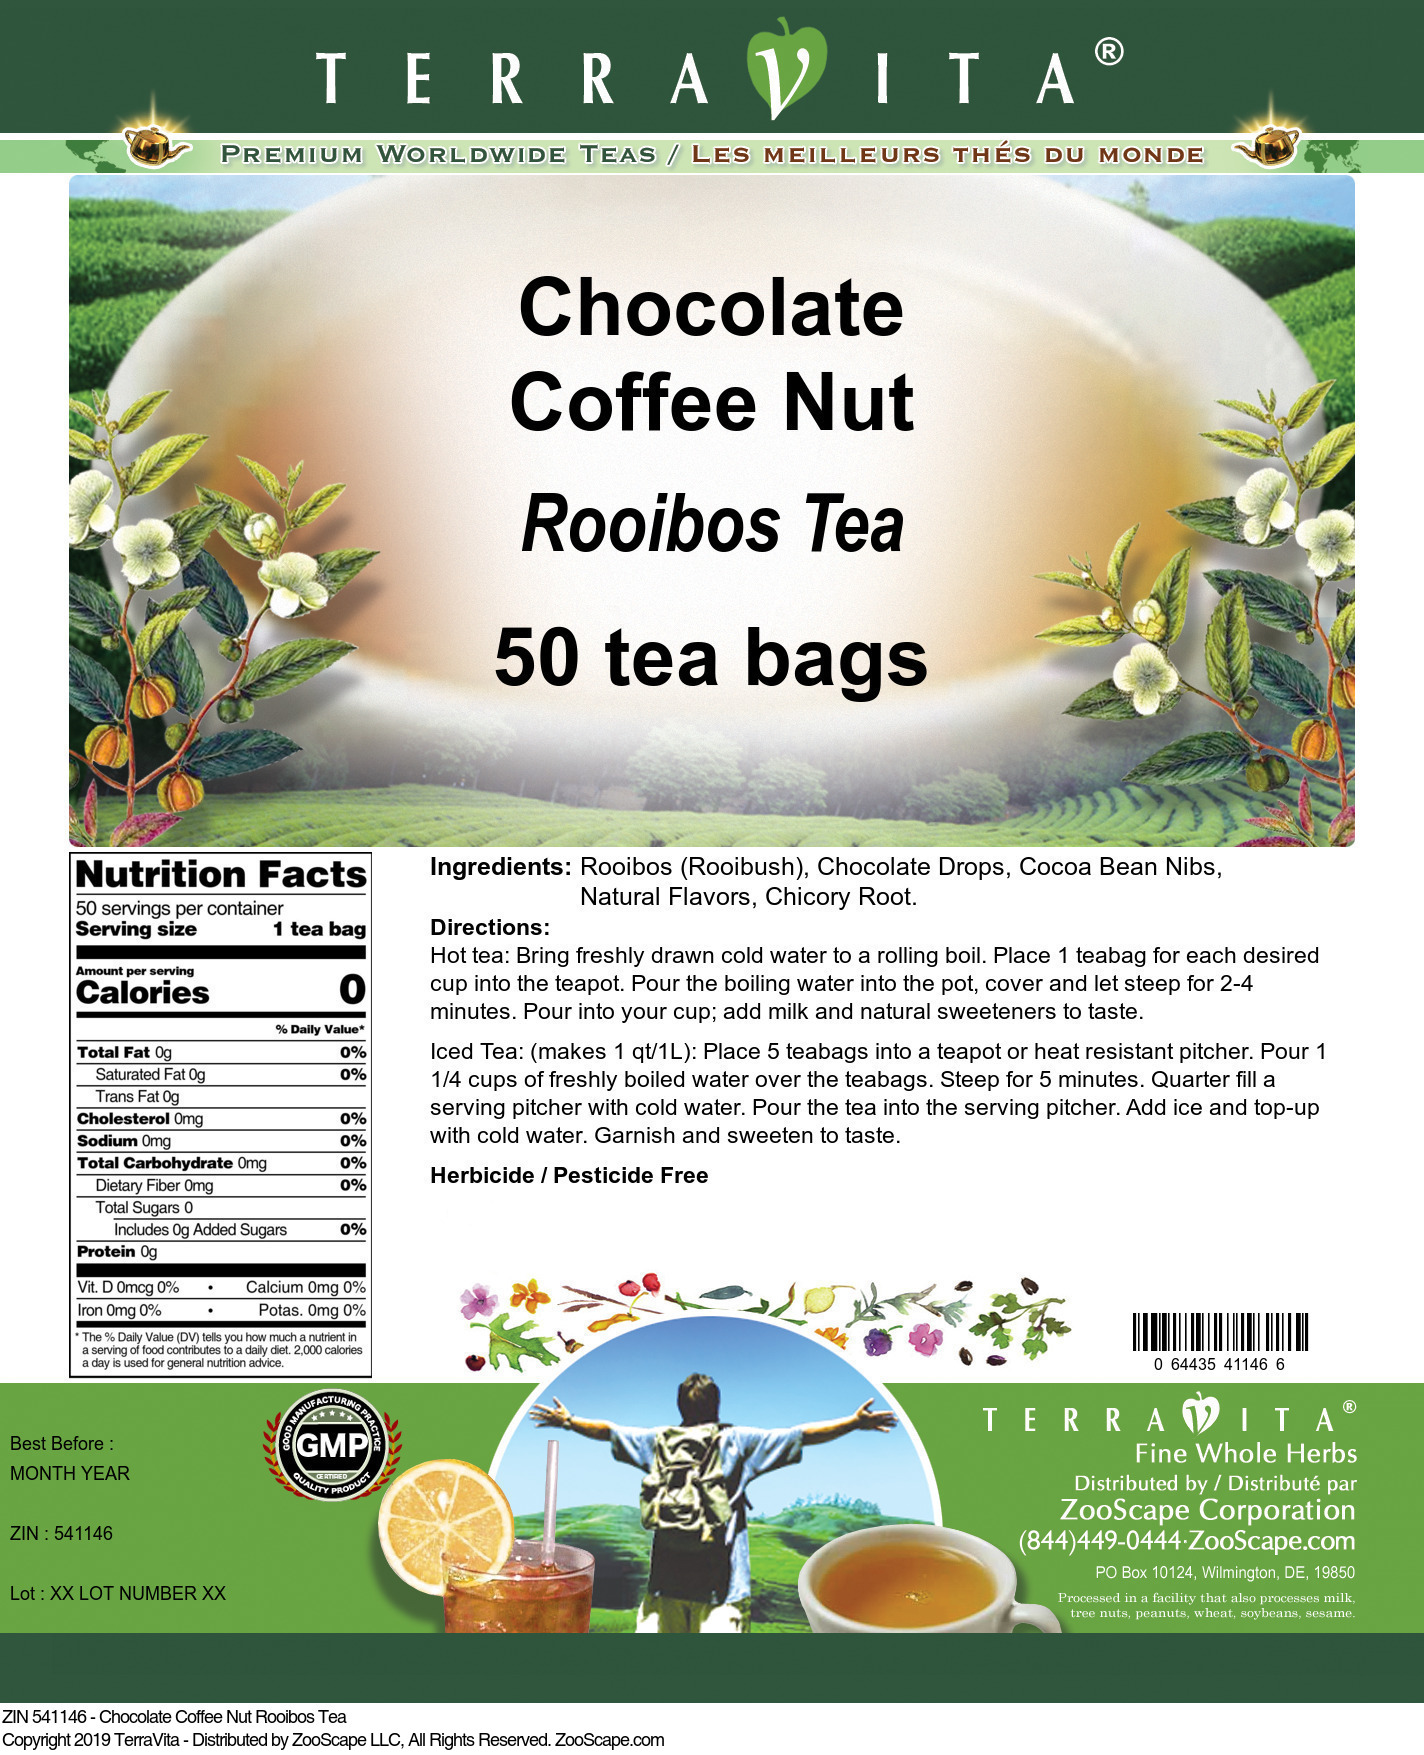 Chocolate Coffee Nut Rooibos Tea